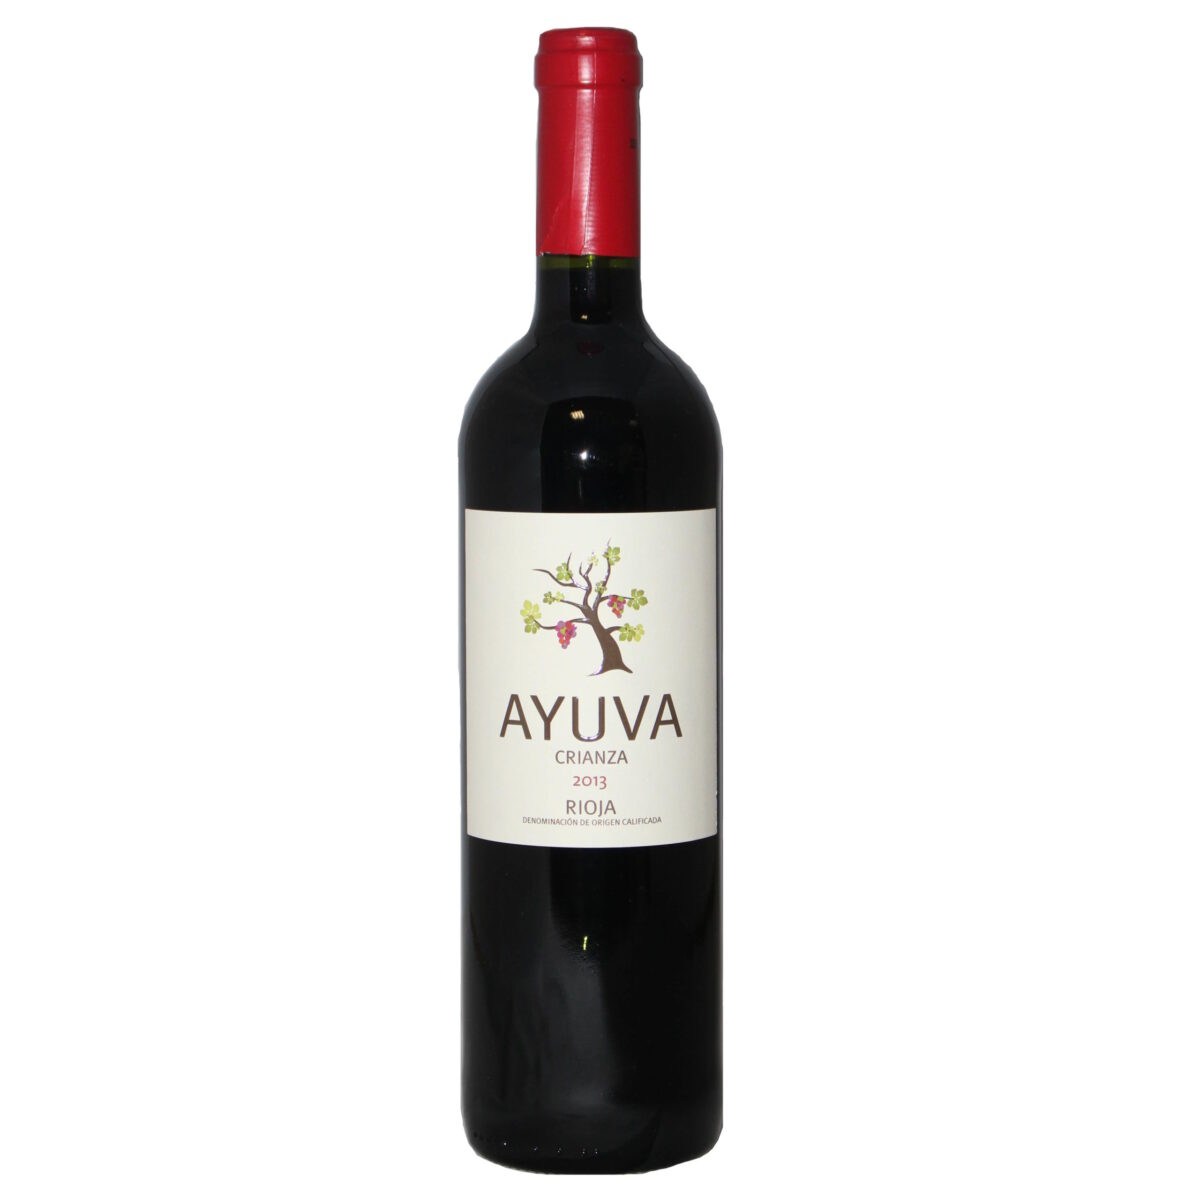 Ayuva Crianza DOC Rioja